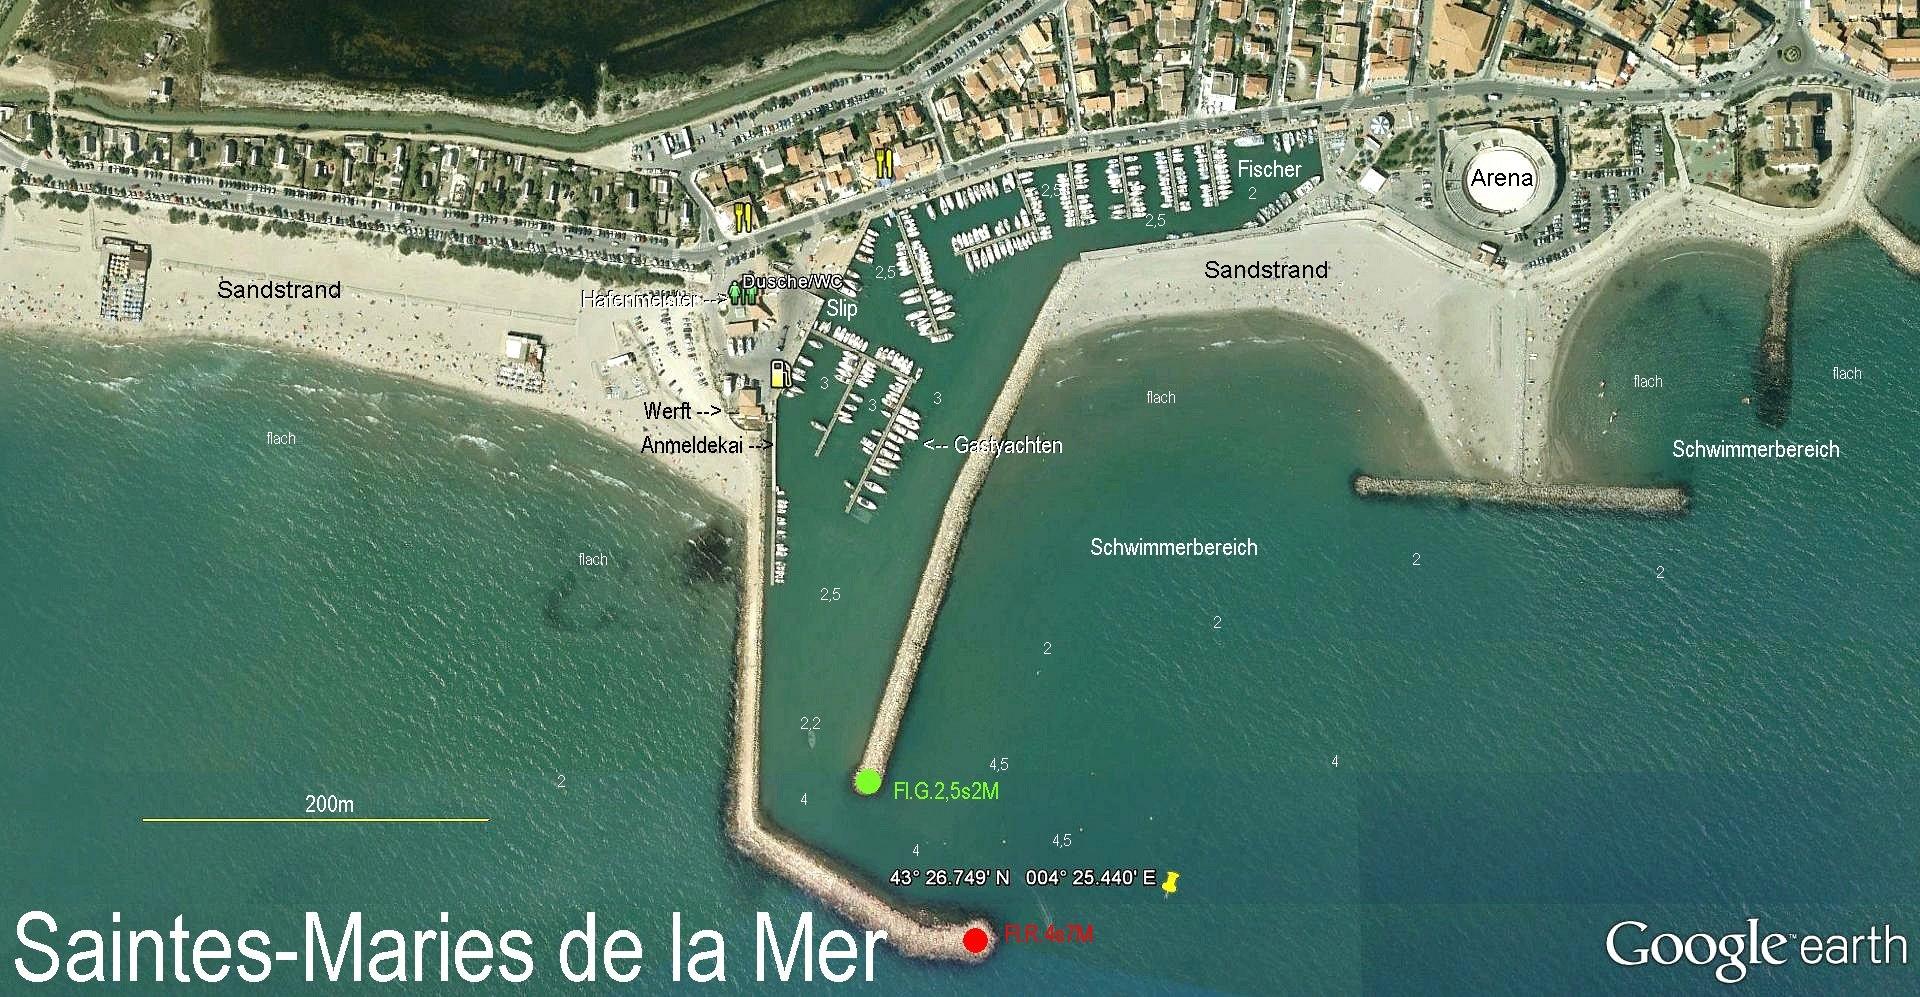 Revierinformation f r segler beschreibung der marina - Office du tourisme saintes marie de la mer ...